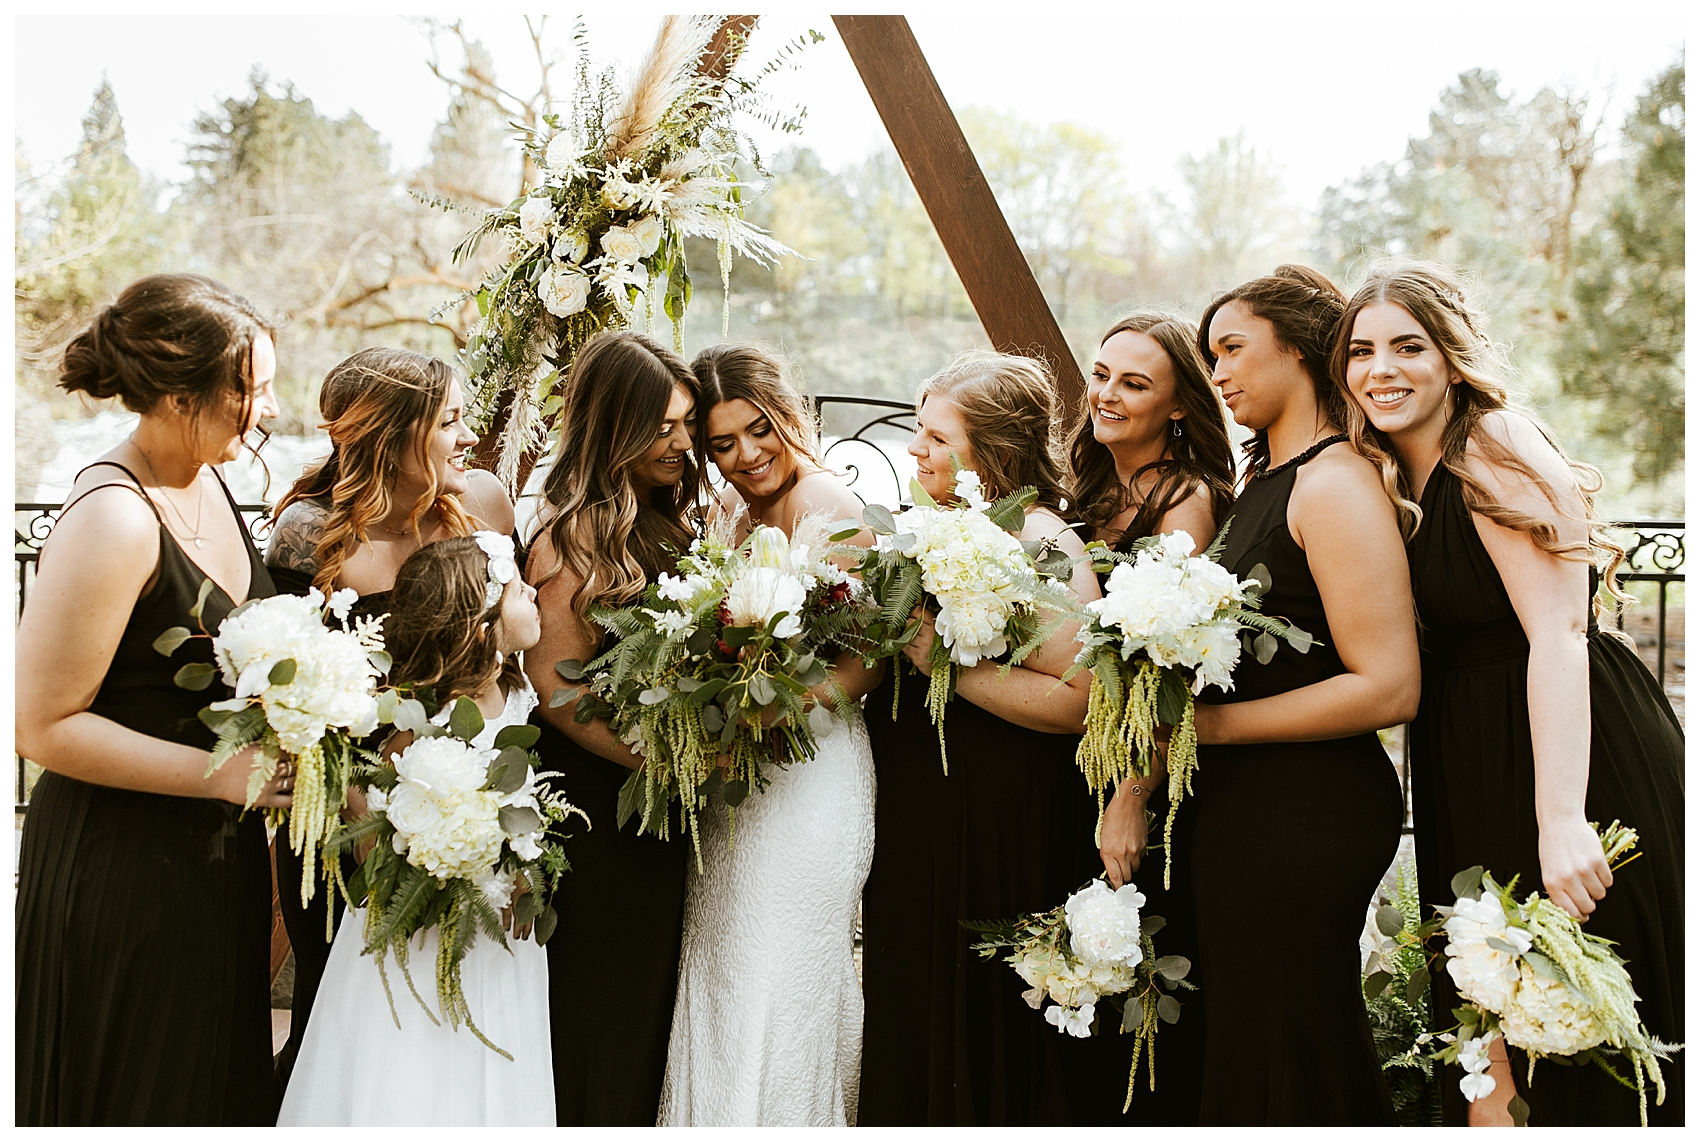 Chateau Rive Spokane Wedding Cassie Trottier Photography01069.jpg